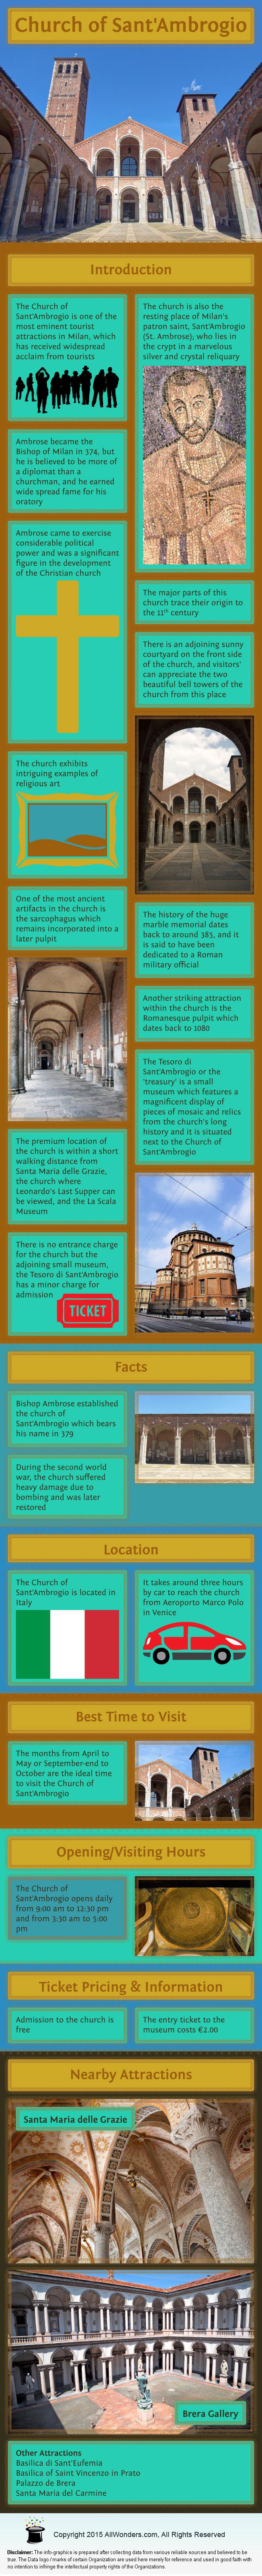 Sant' Ambrogio Basilica Infographic